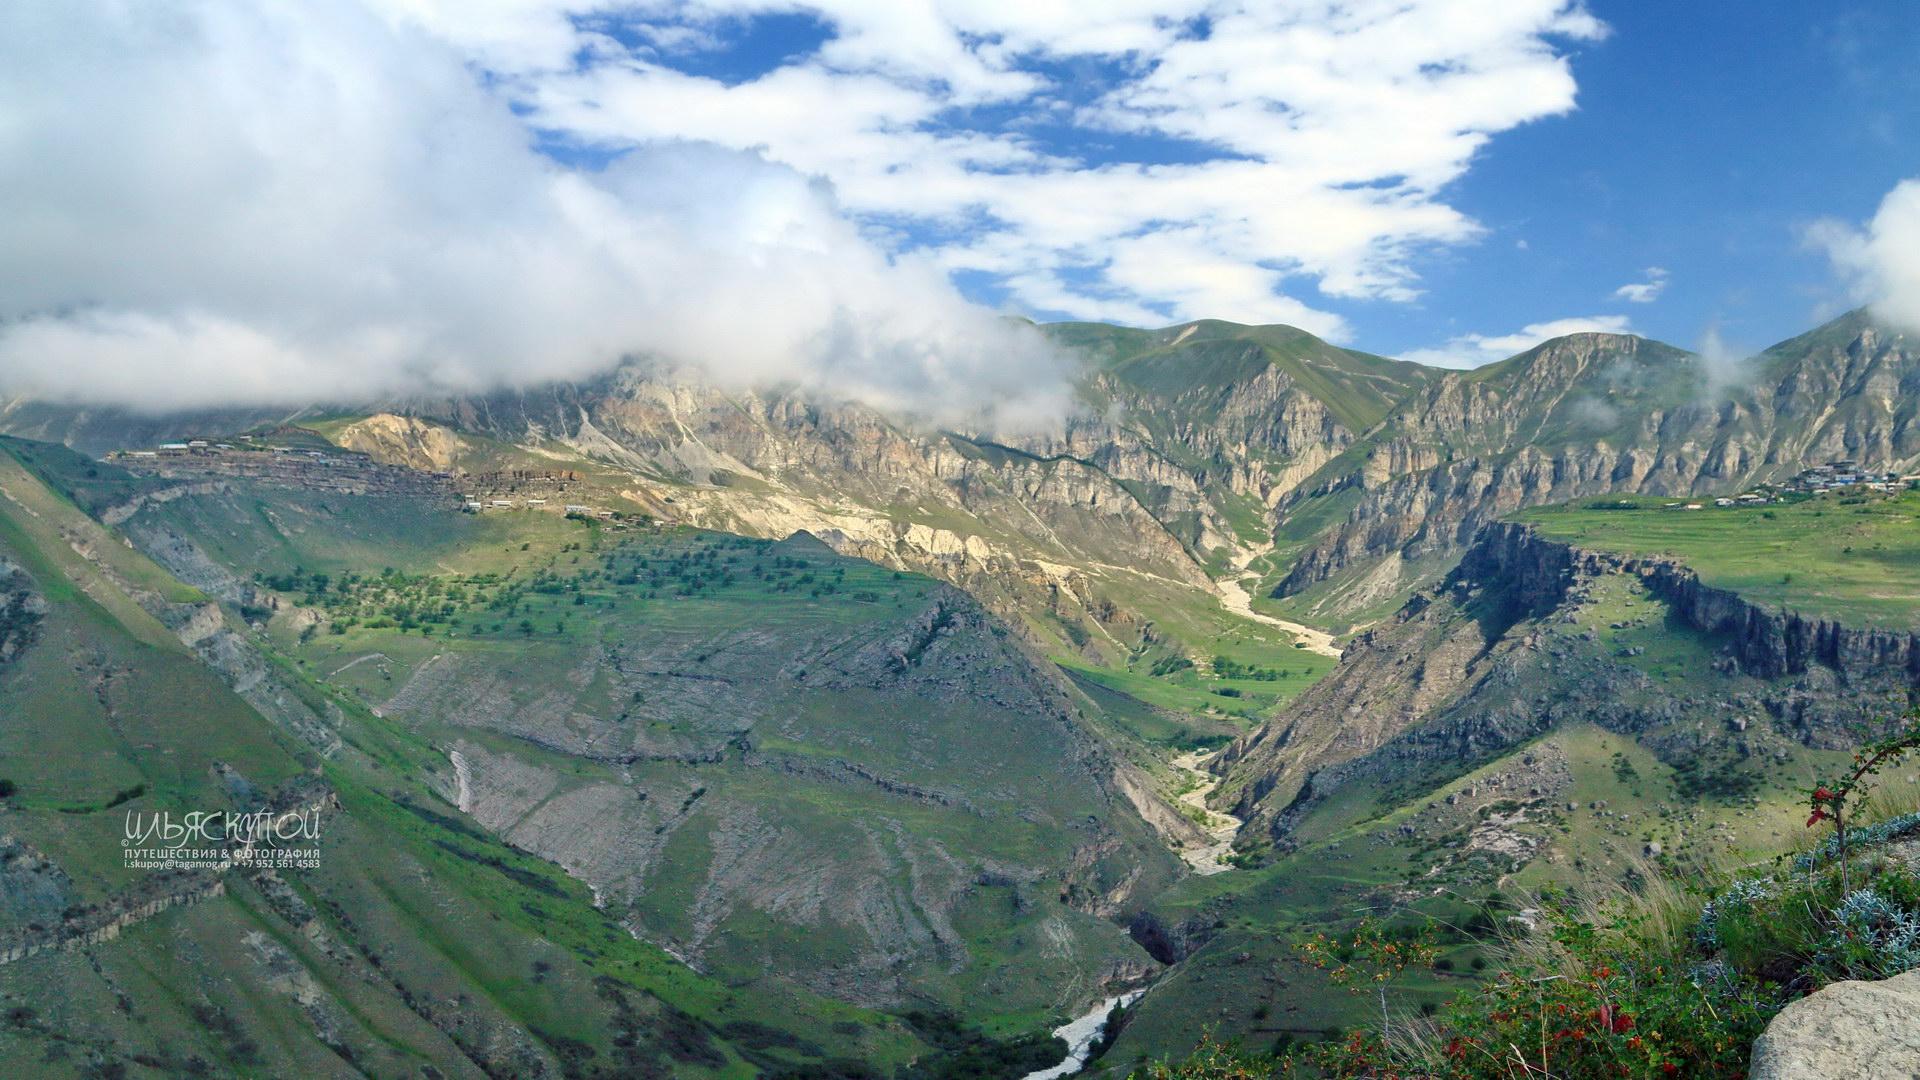 http://ws.pp.ru/foto/200123.Dagestan1.1920x1080.03.JPG